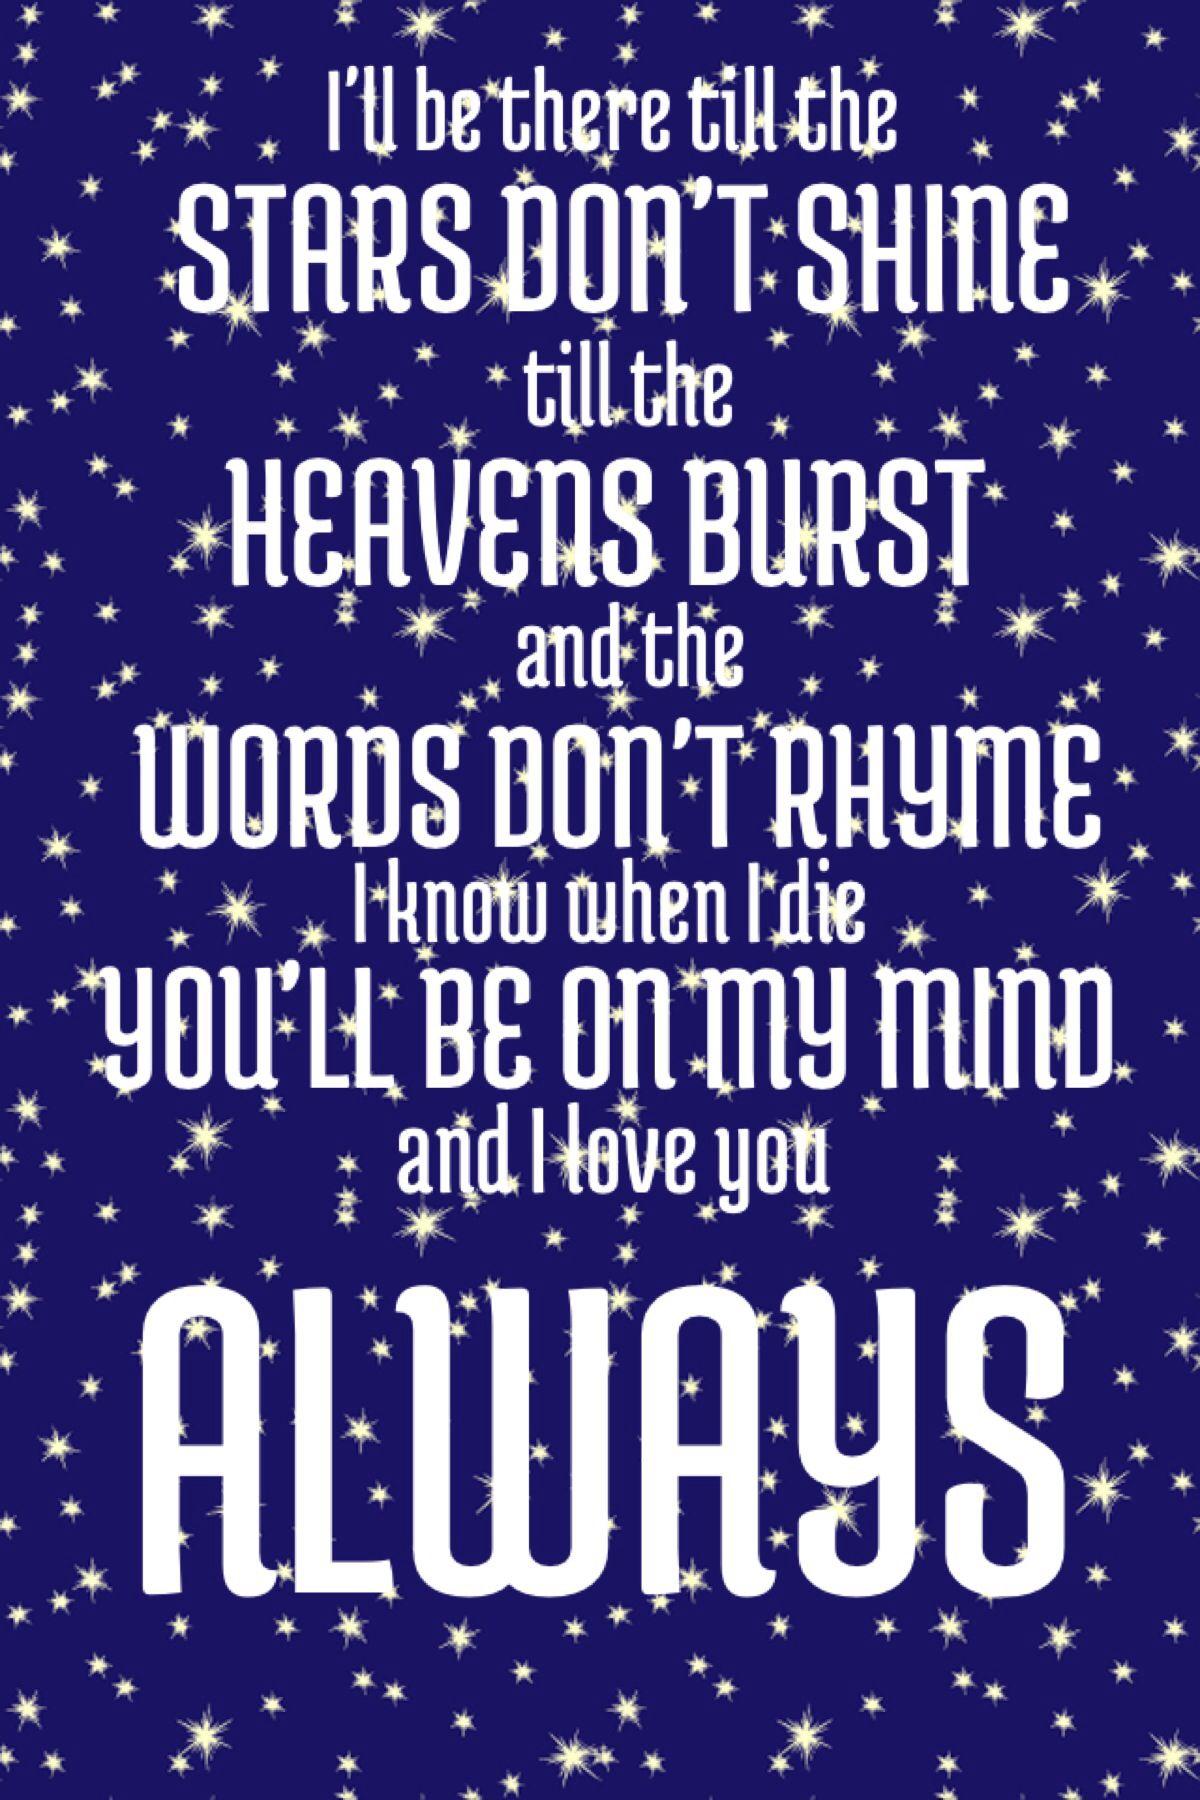 ... Jacquees Ft. Quavo & Ty Dolla Sign - B.E.D Pt. 2 (Lyrics On ...